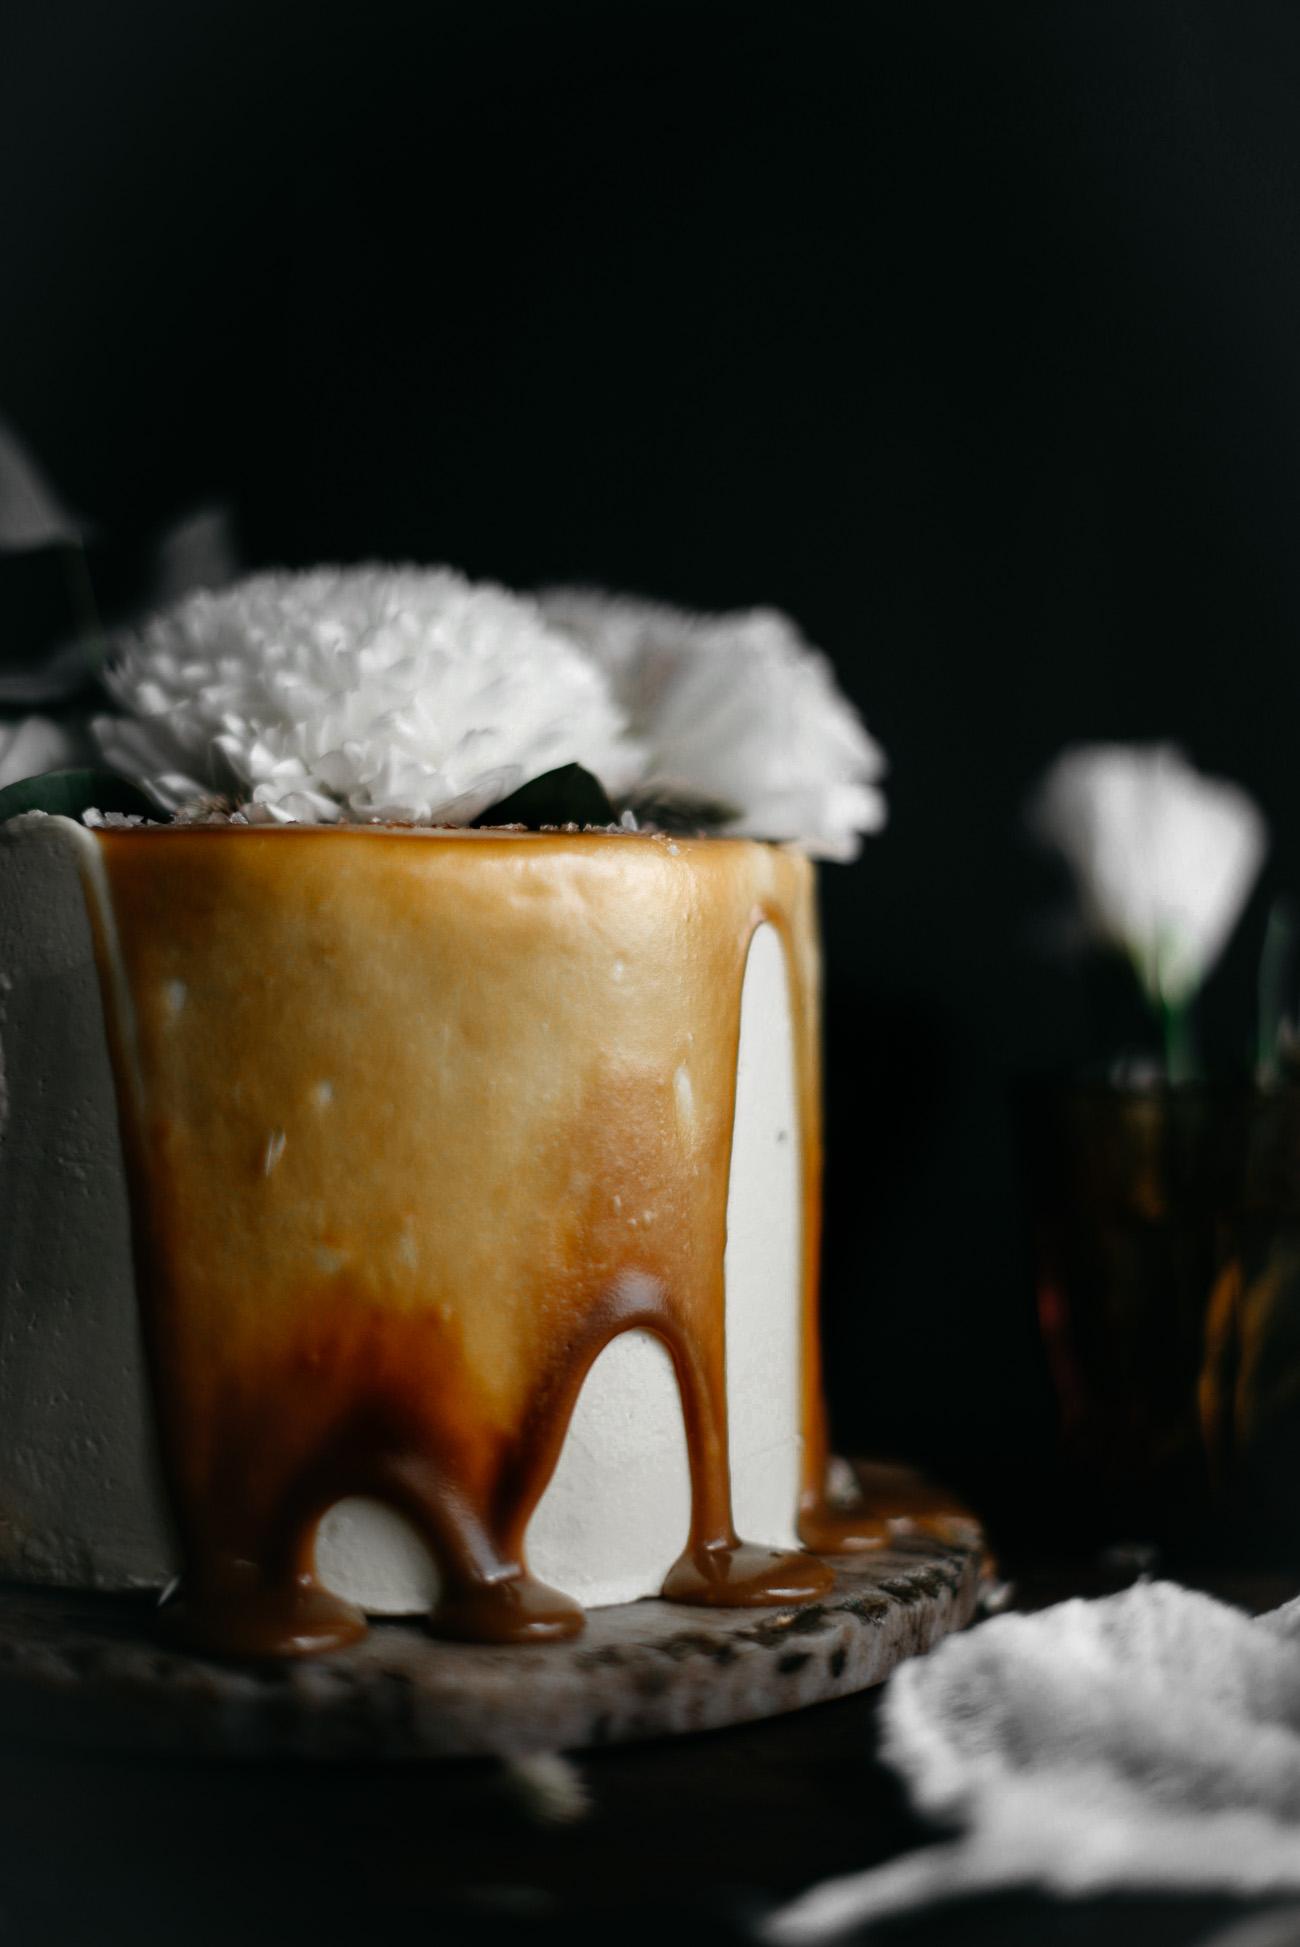 Italian-Orange-Blossom-and-Almond-Cake-with-Orange-Curd-Mascarpone-Swiss-Meringue-Buttercream-and-Fleur-d'Oranger-Caramel-5.jpg